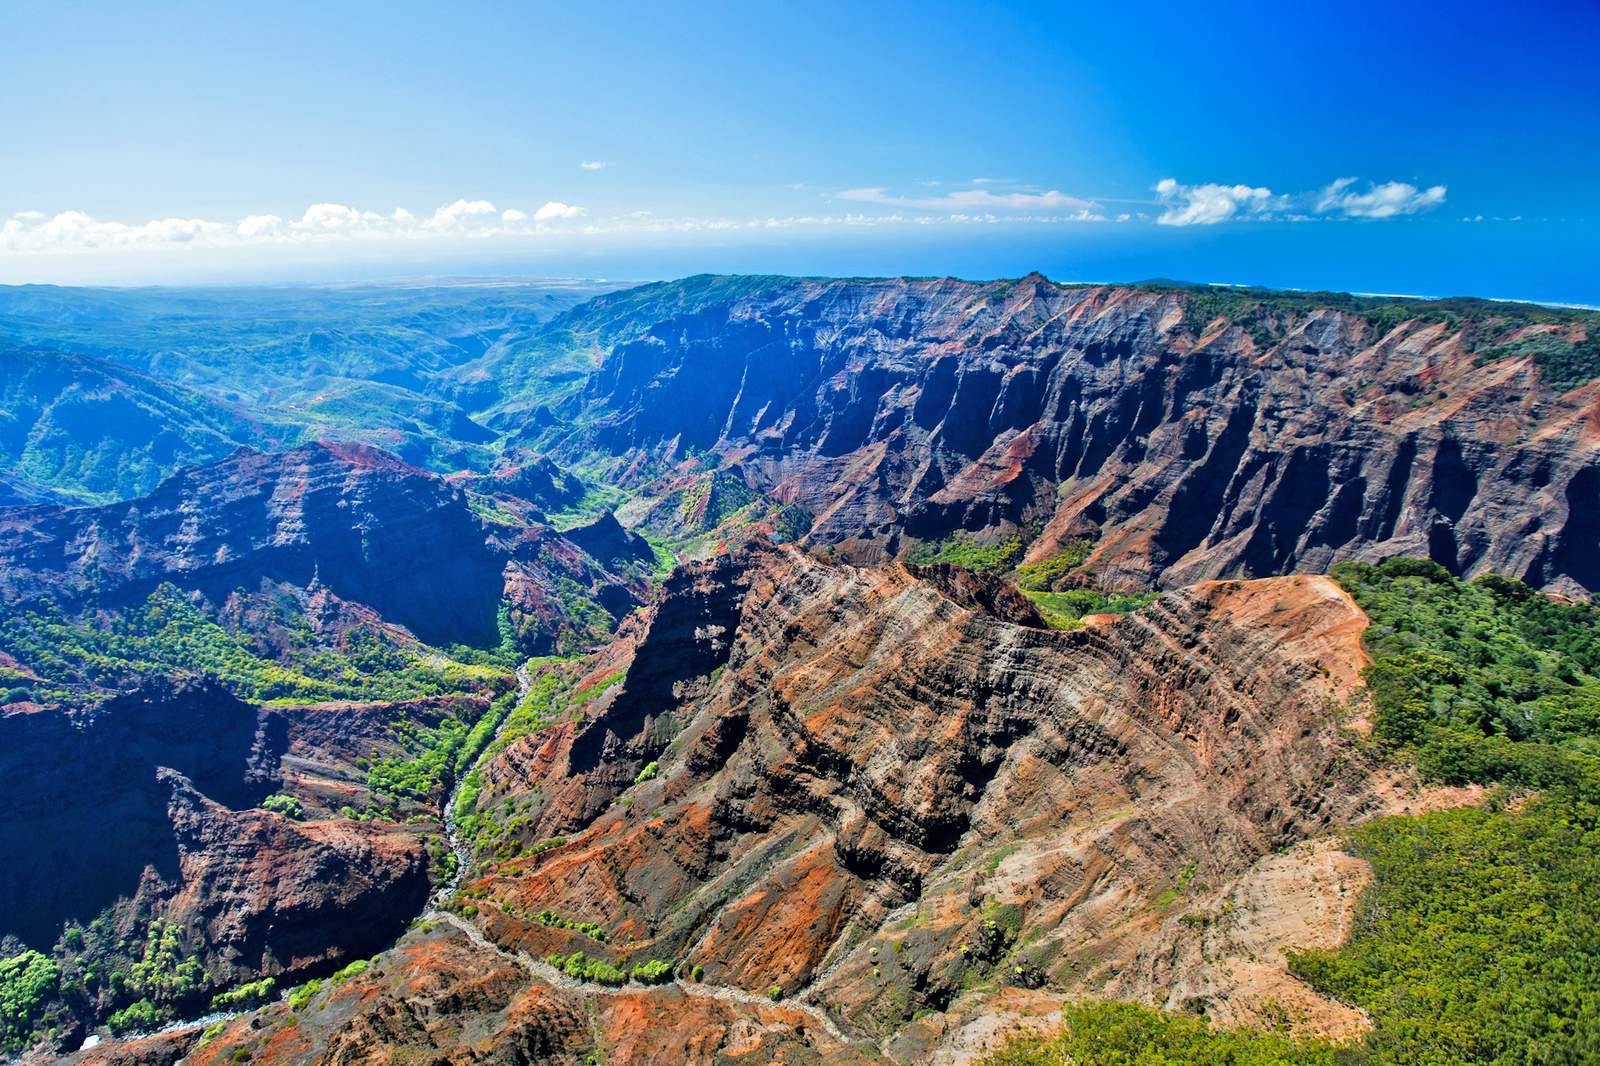 Waimea Canyon, der Grand Canyon des Pazifiks, auf Kauai